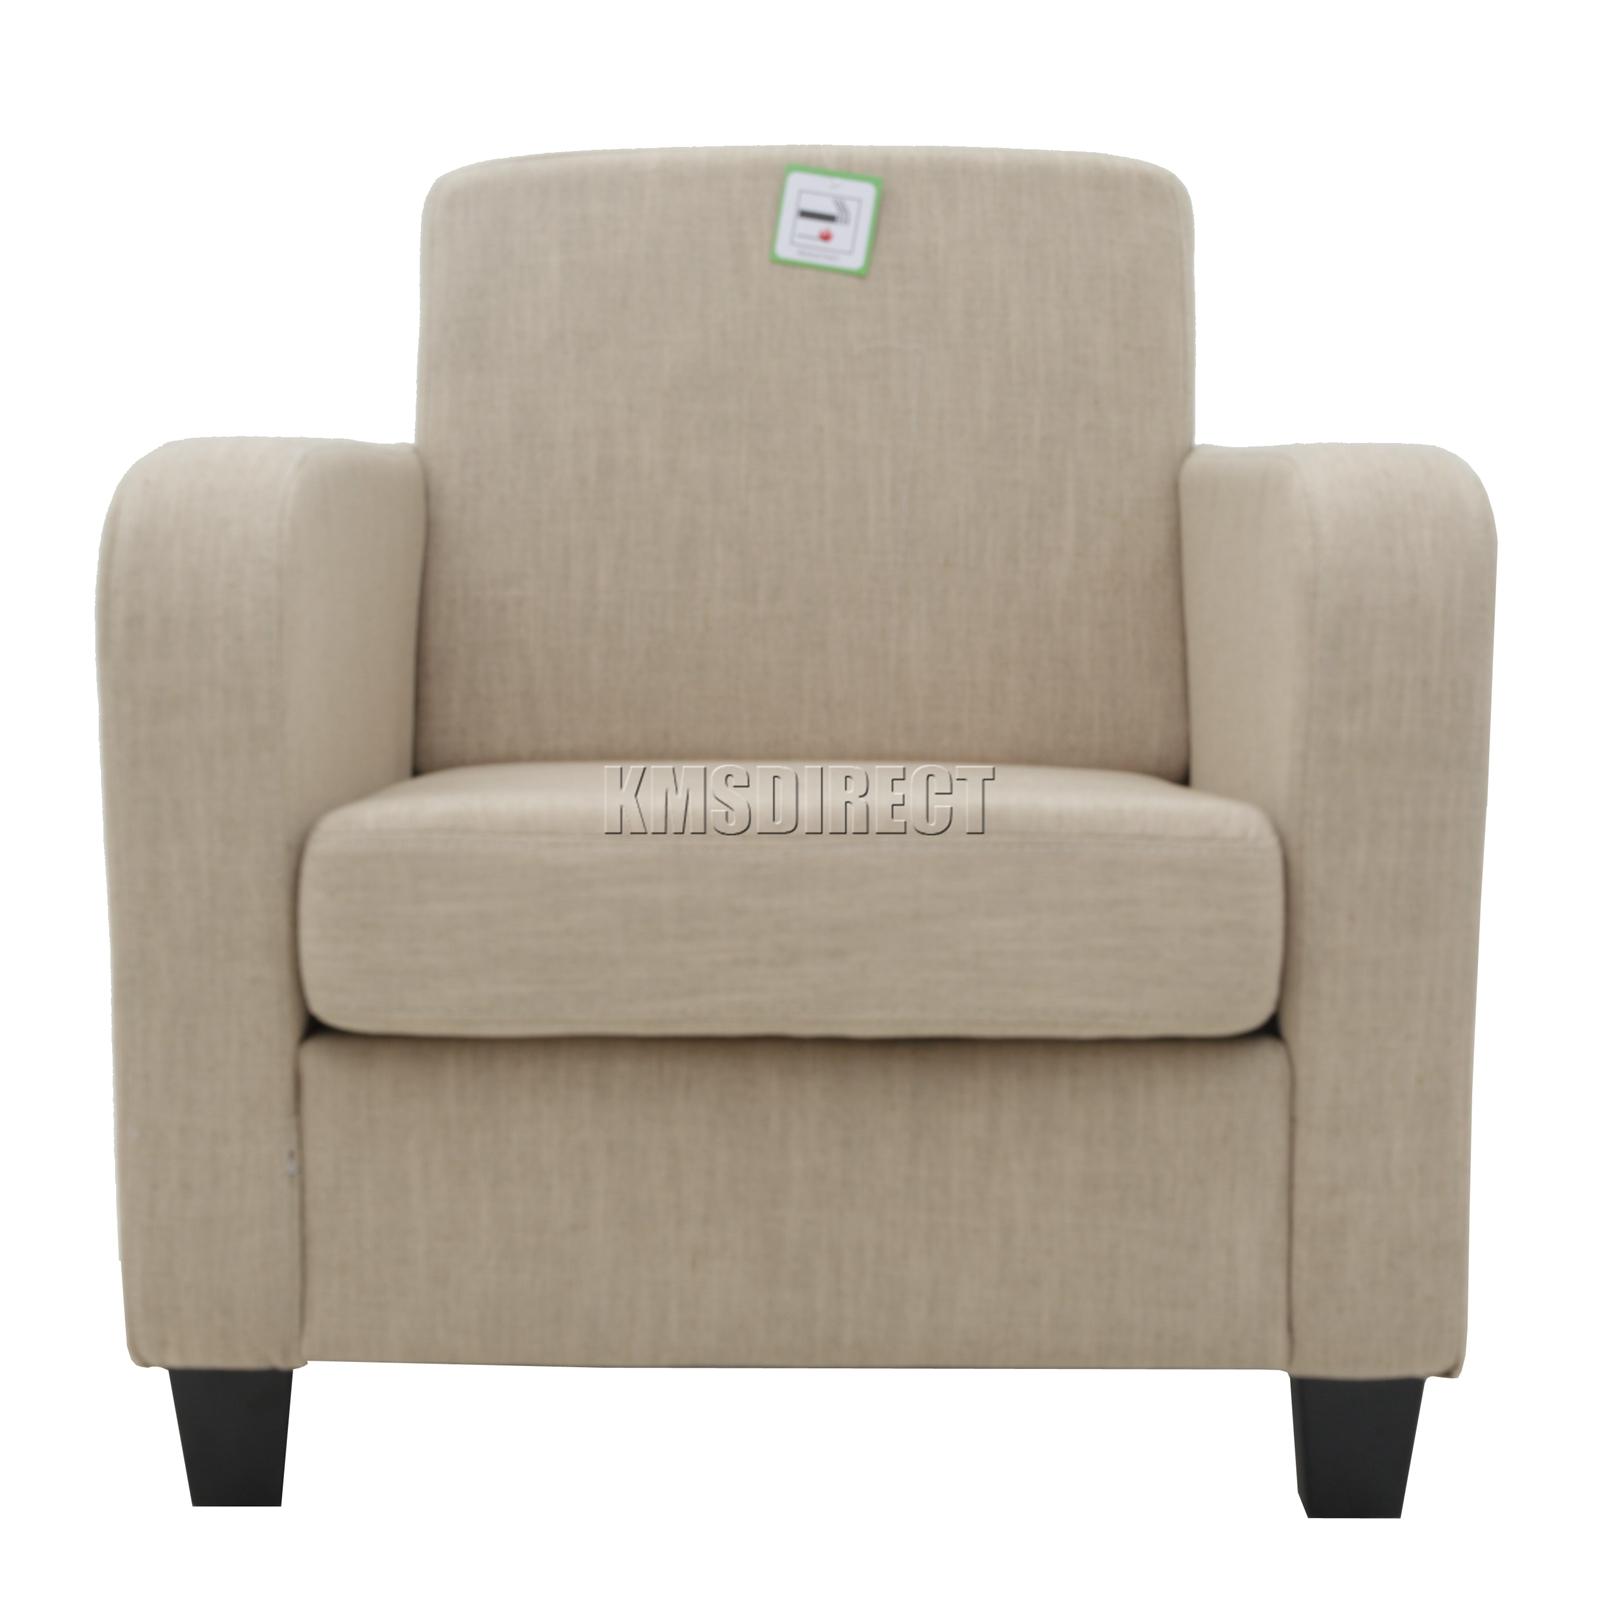 Foxhunter tela de lino butaca comedor sala de estar sal n for Sala de estar oficina